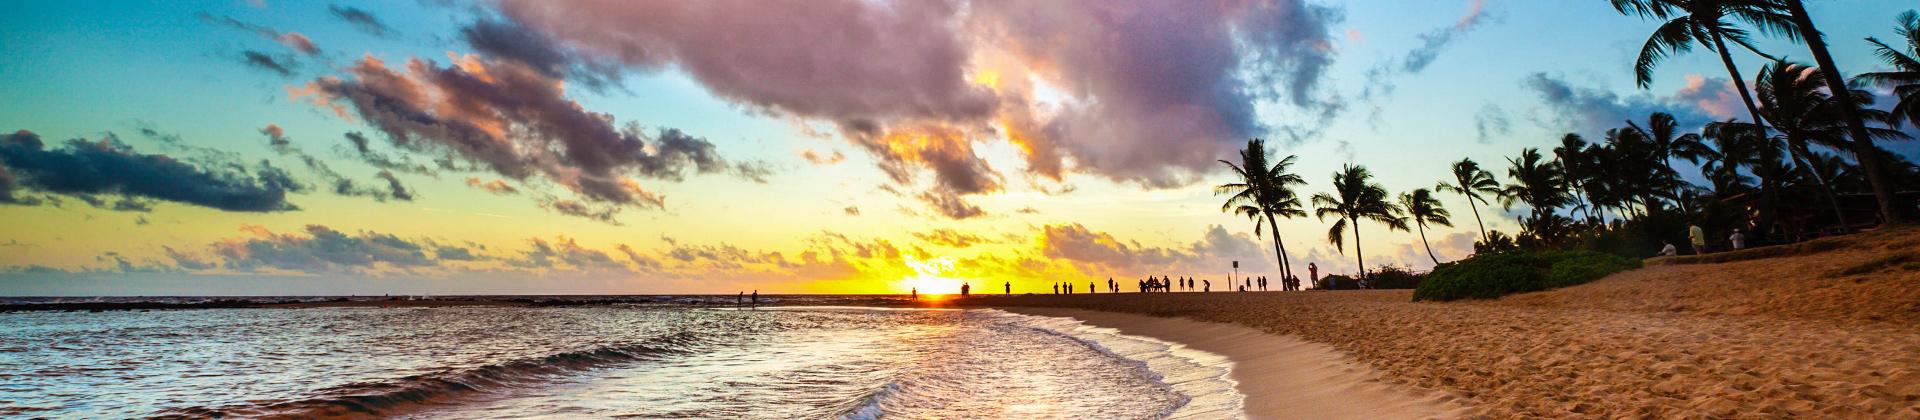 Strand op Hawaii